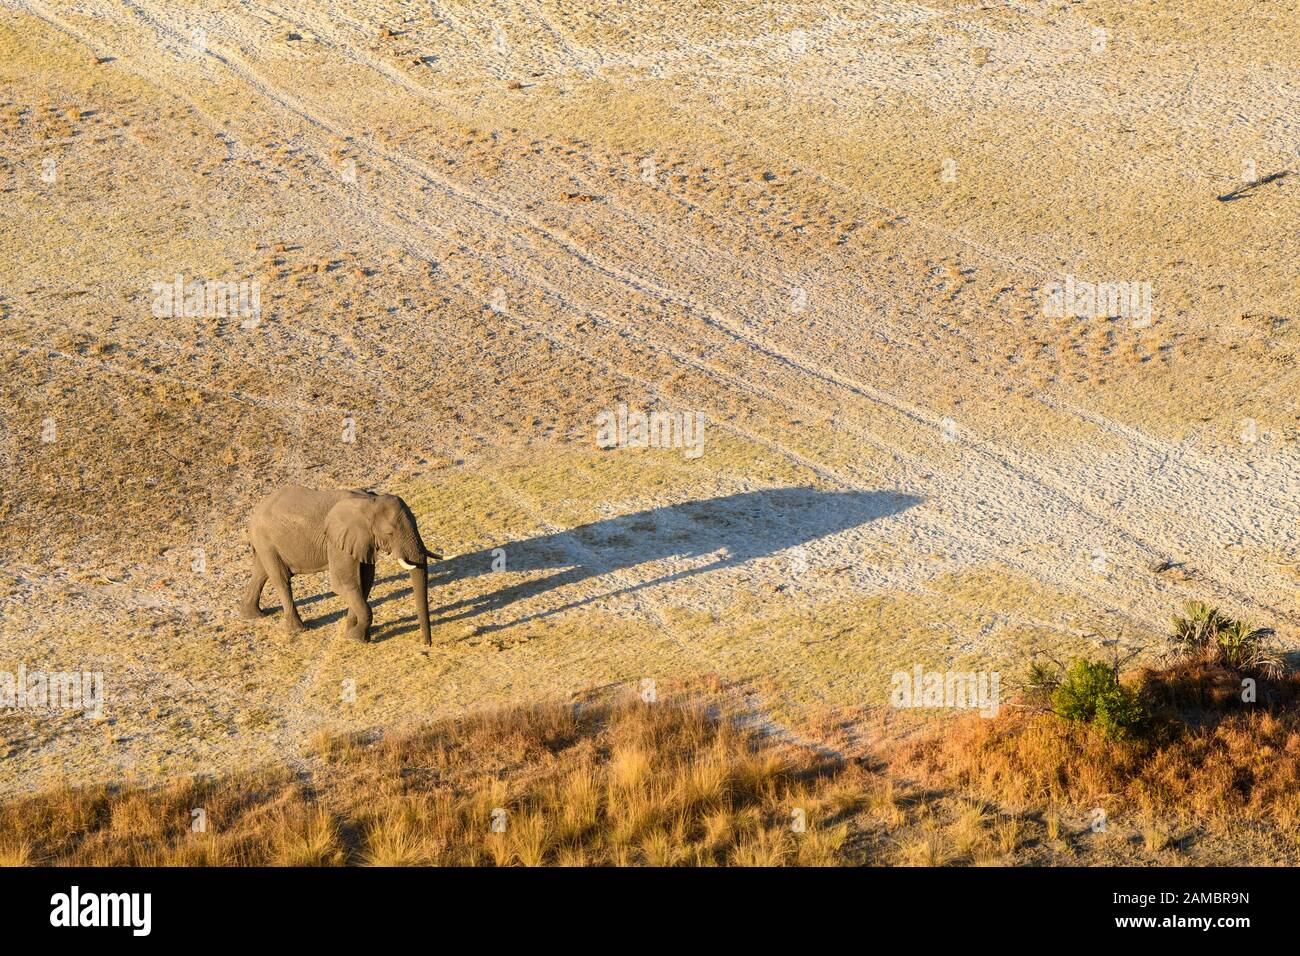 Aerial view of African Elephant, Loxodonta africana, and shadow, Macatoo, Okavango Delta, Botswana Stock Photo